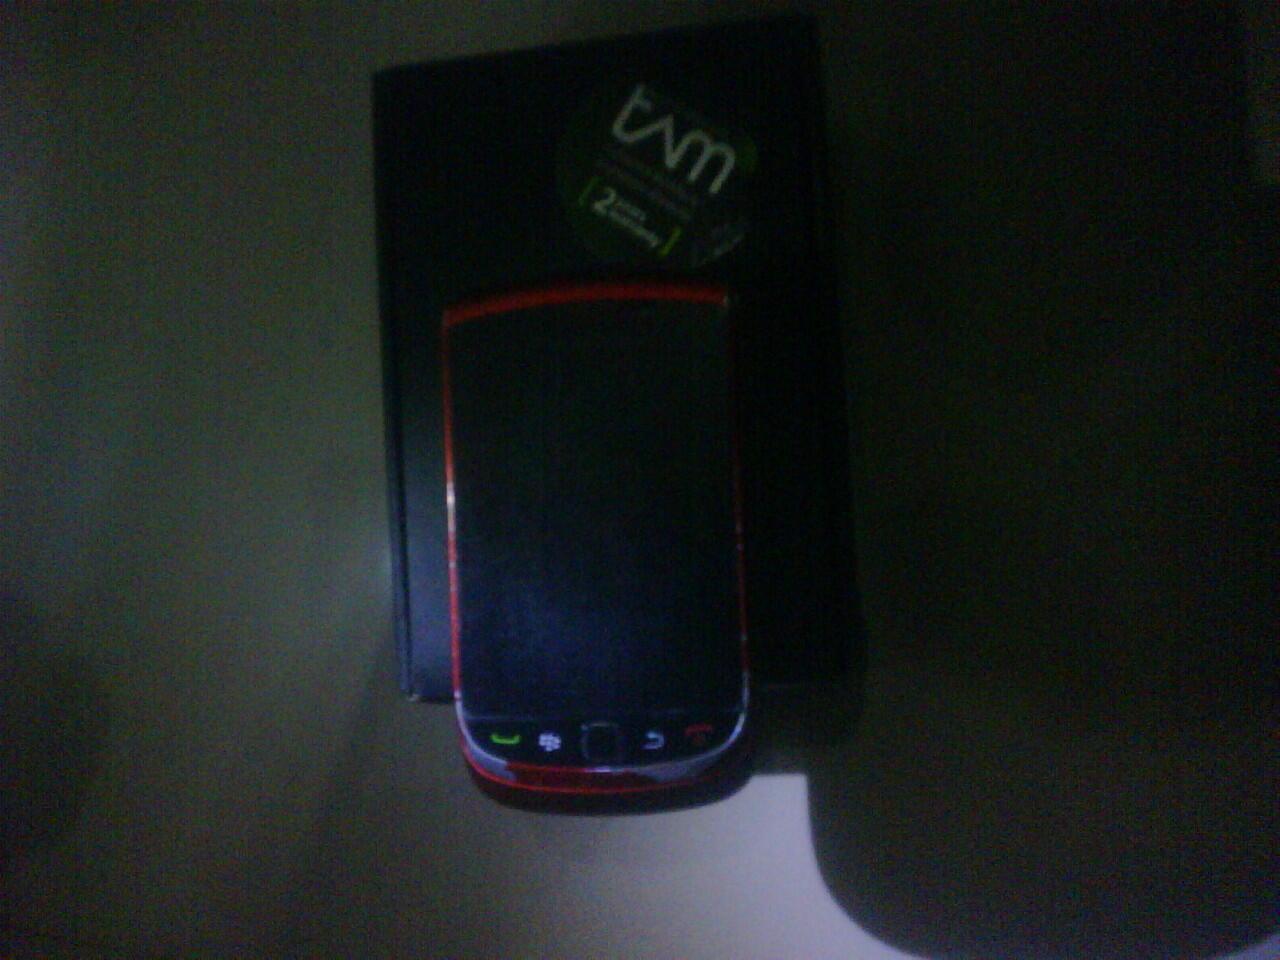 BLACKBERRY TORCH 9800 RED